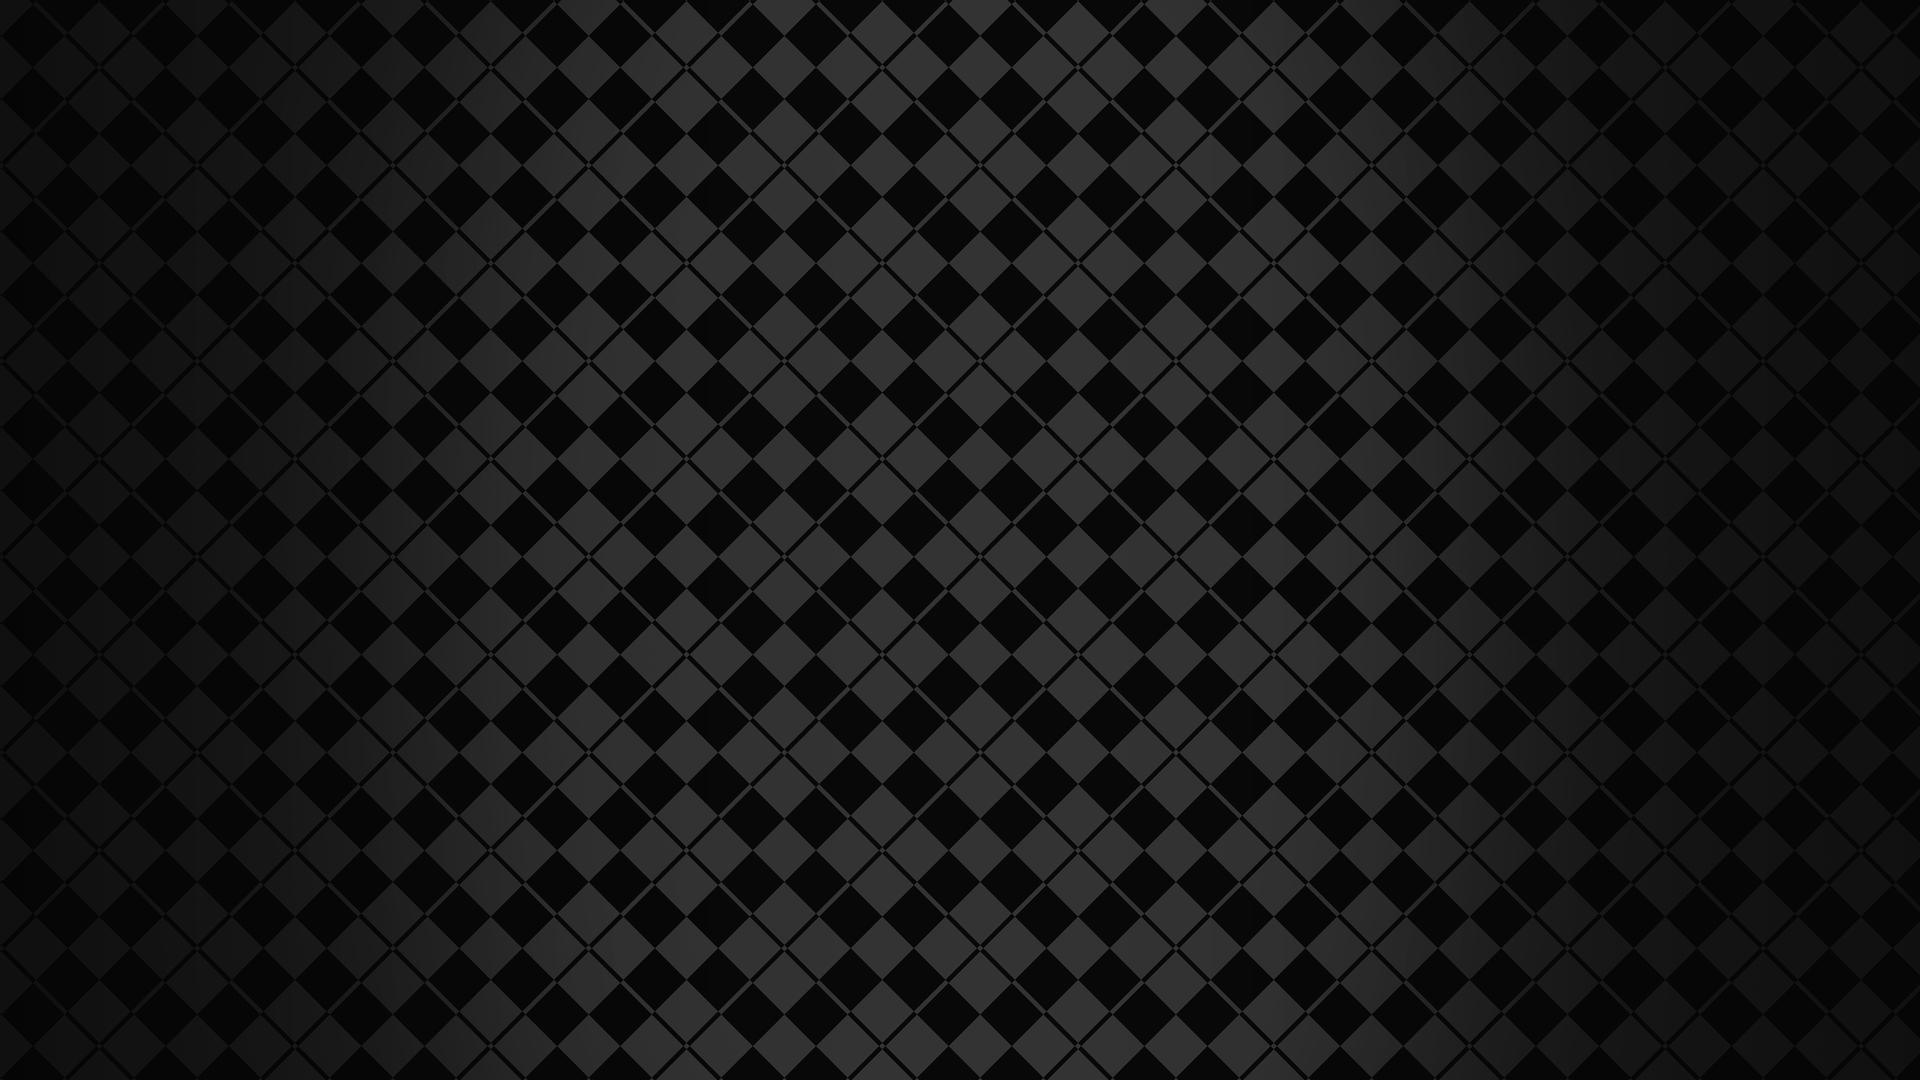 1920x1080 pattern square texture 4k laptop full hd 1080p - Hd pattern wallpapers 1080p ...